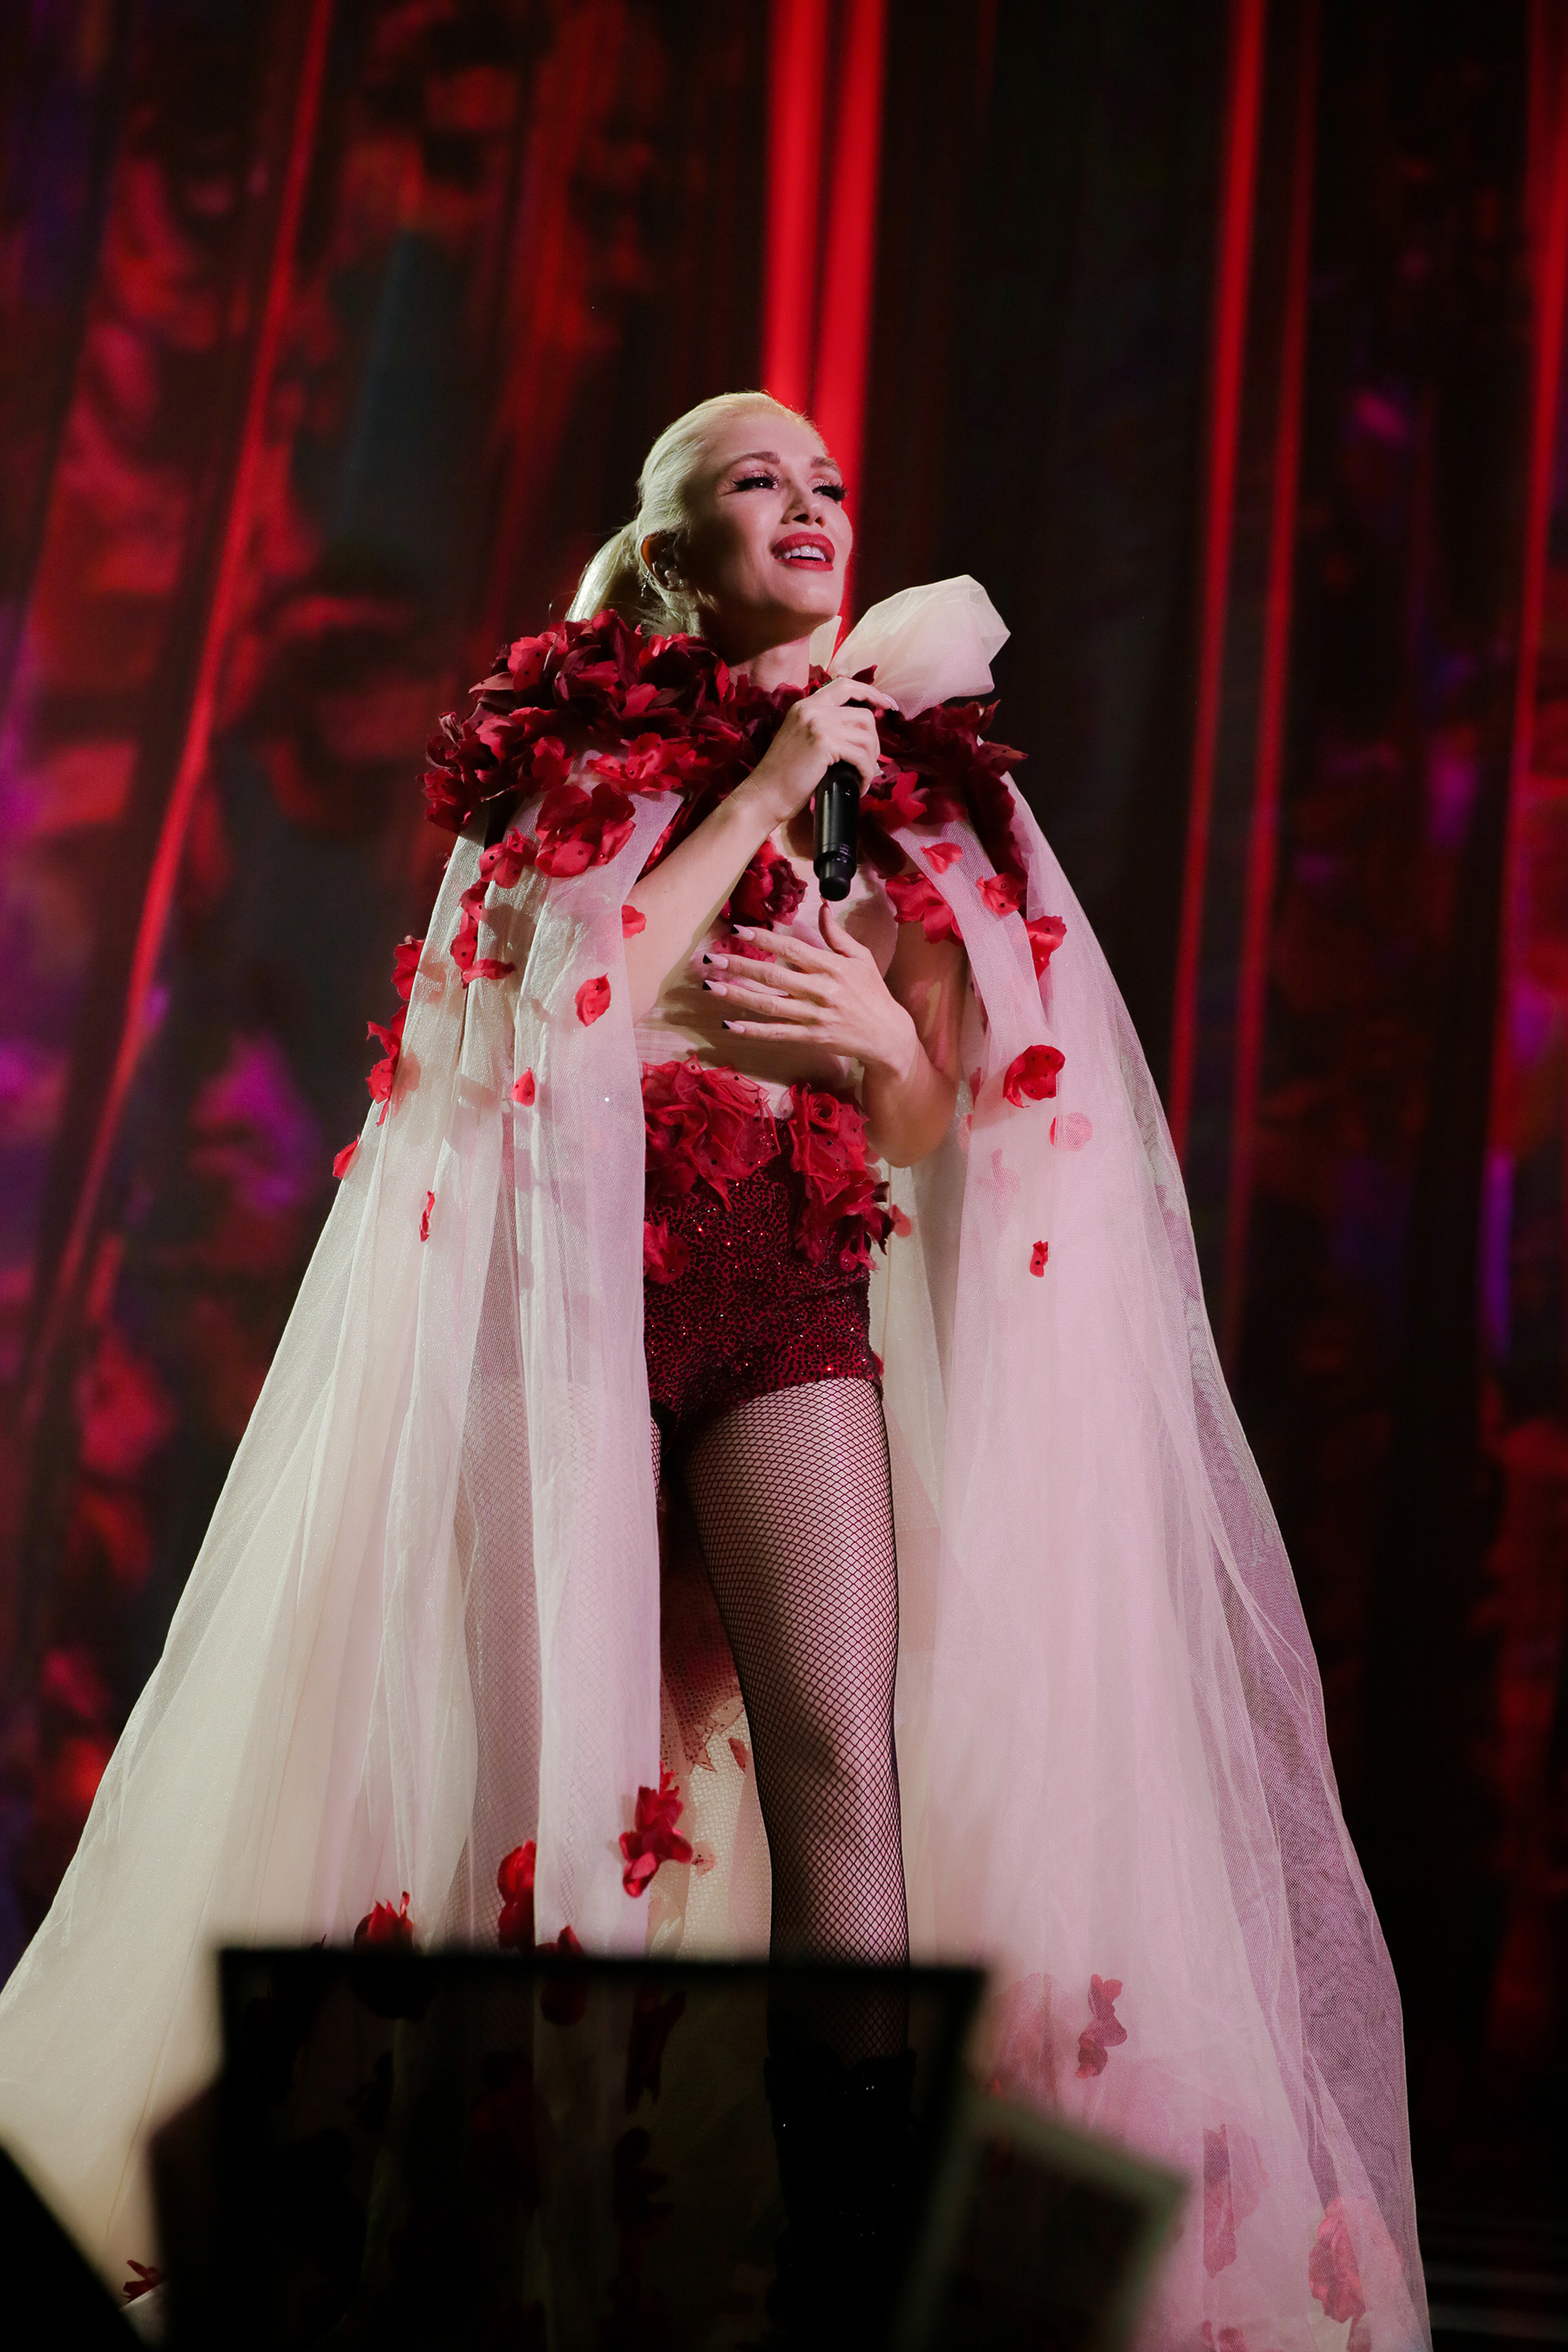 Gwen Stefani performing at Zappos Theater at Planet Hollywood Resort & Casino. Photo Credit: Todd Stefani